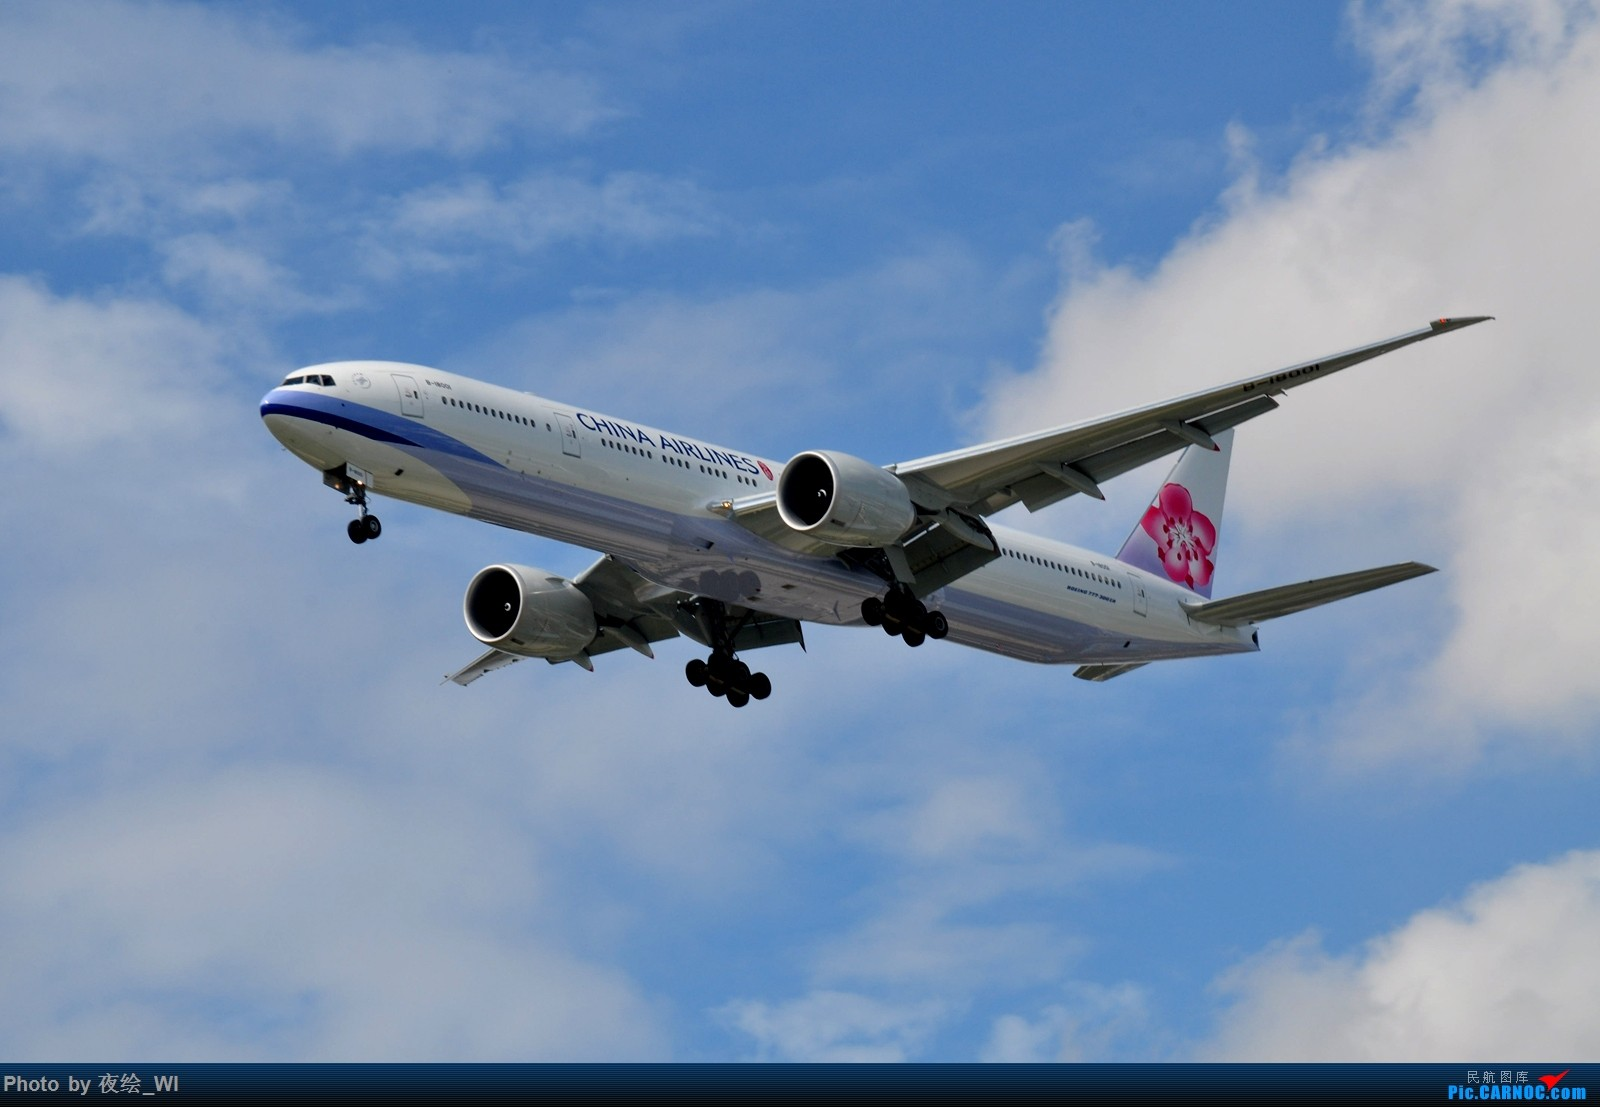 Re:[原创]【PVG】不只守着NKG,国庆疯狂拍机之浦东行,天空美得简直不像话! BOEING 777-300ER B-18001 中国上海浦东国际机场